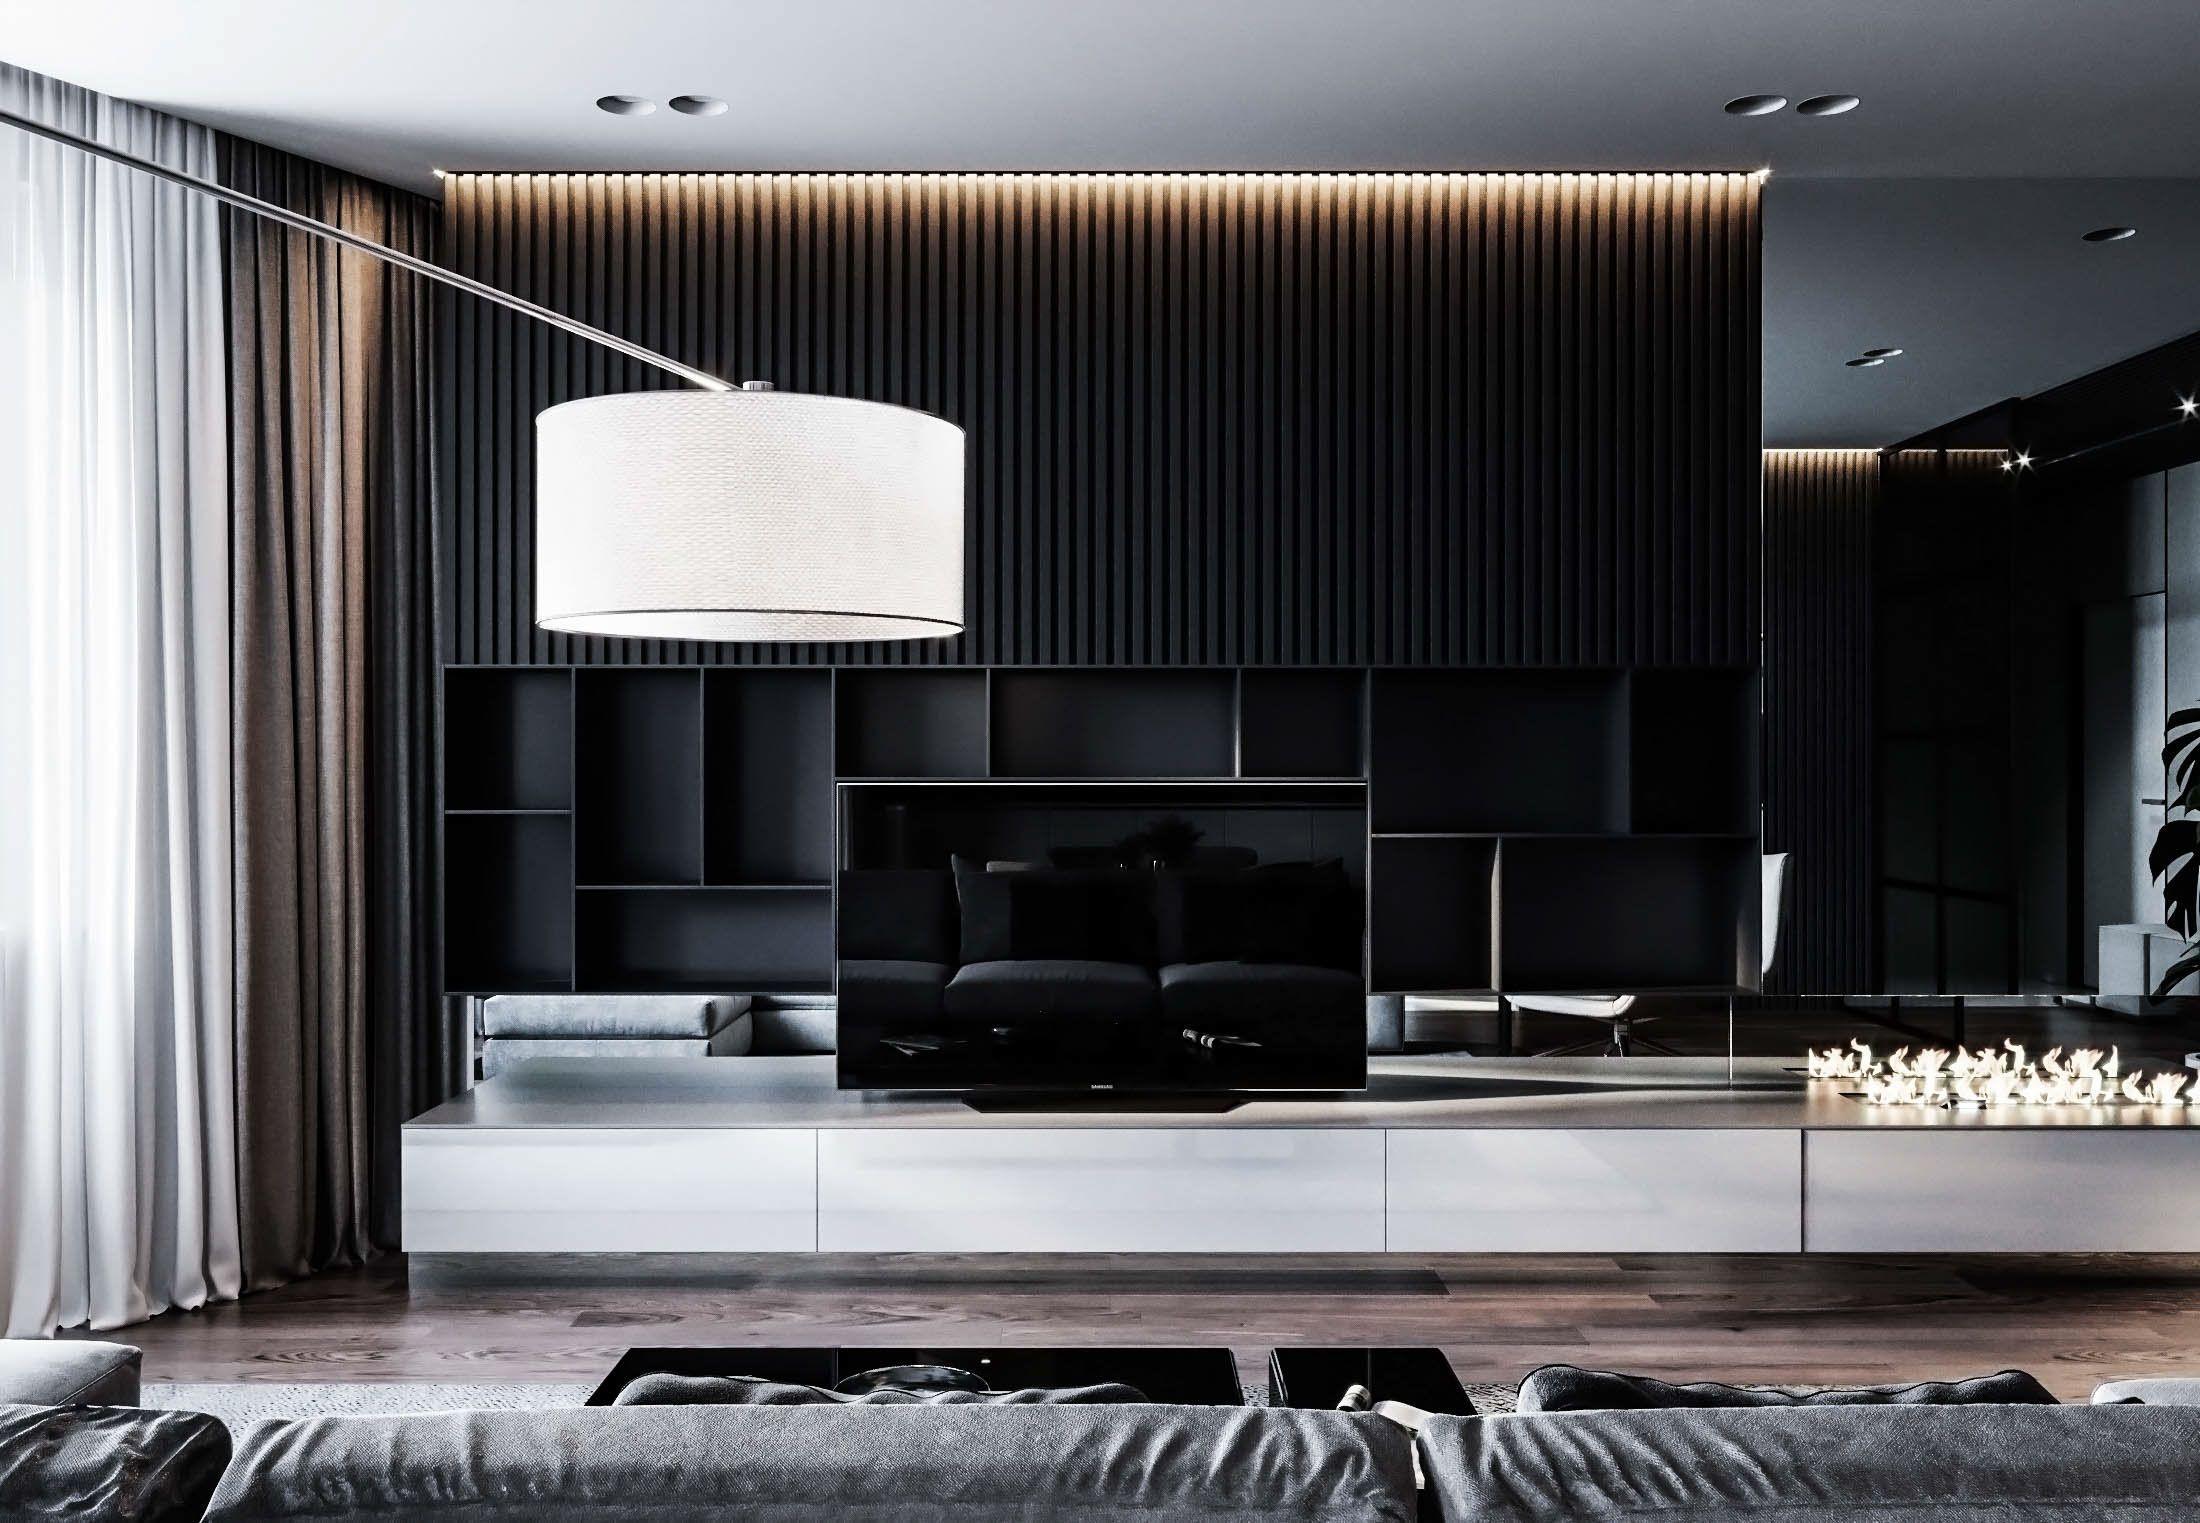 Pin by patrick hsieh on 客餐廳設計參考 現代風格 in 2018